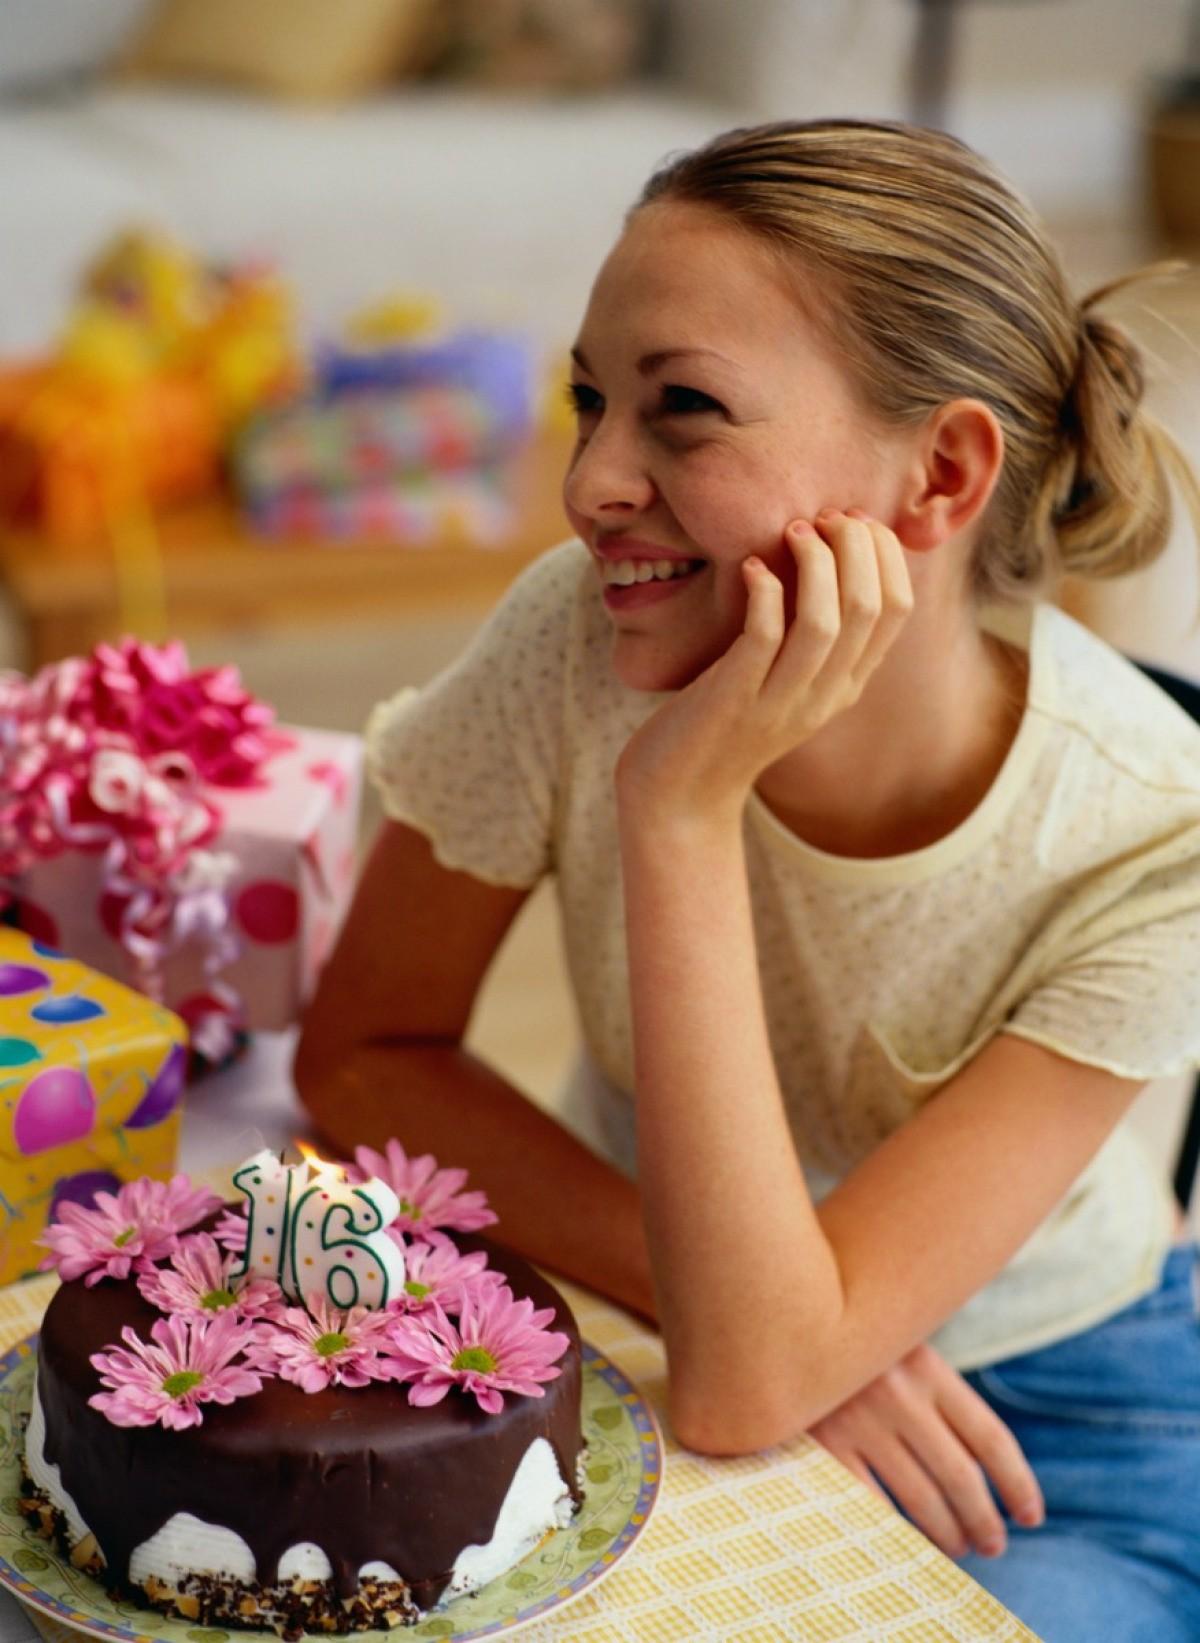 16th Birthday Gift Ideas For Girls Thriftyfun